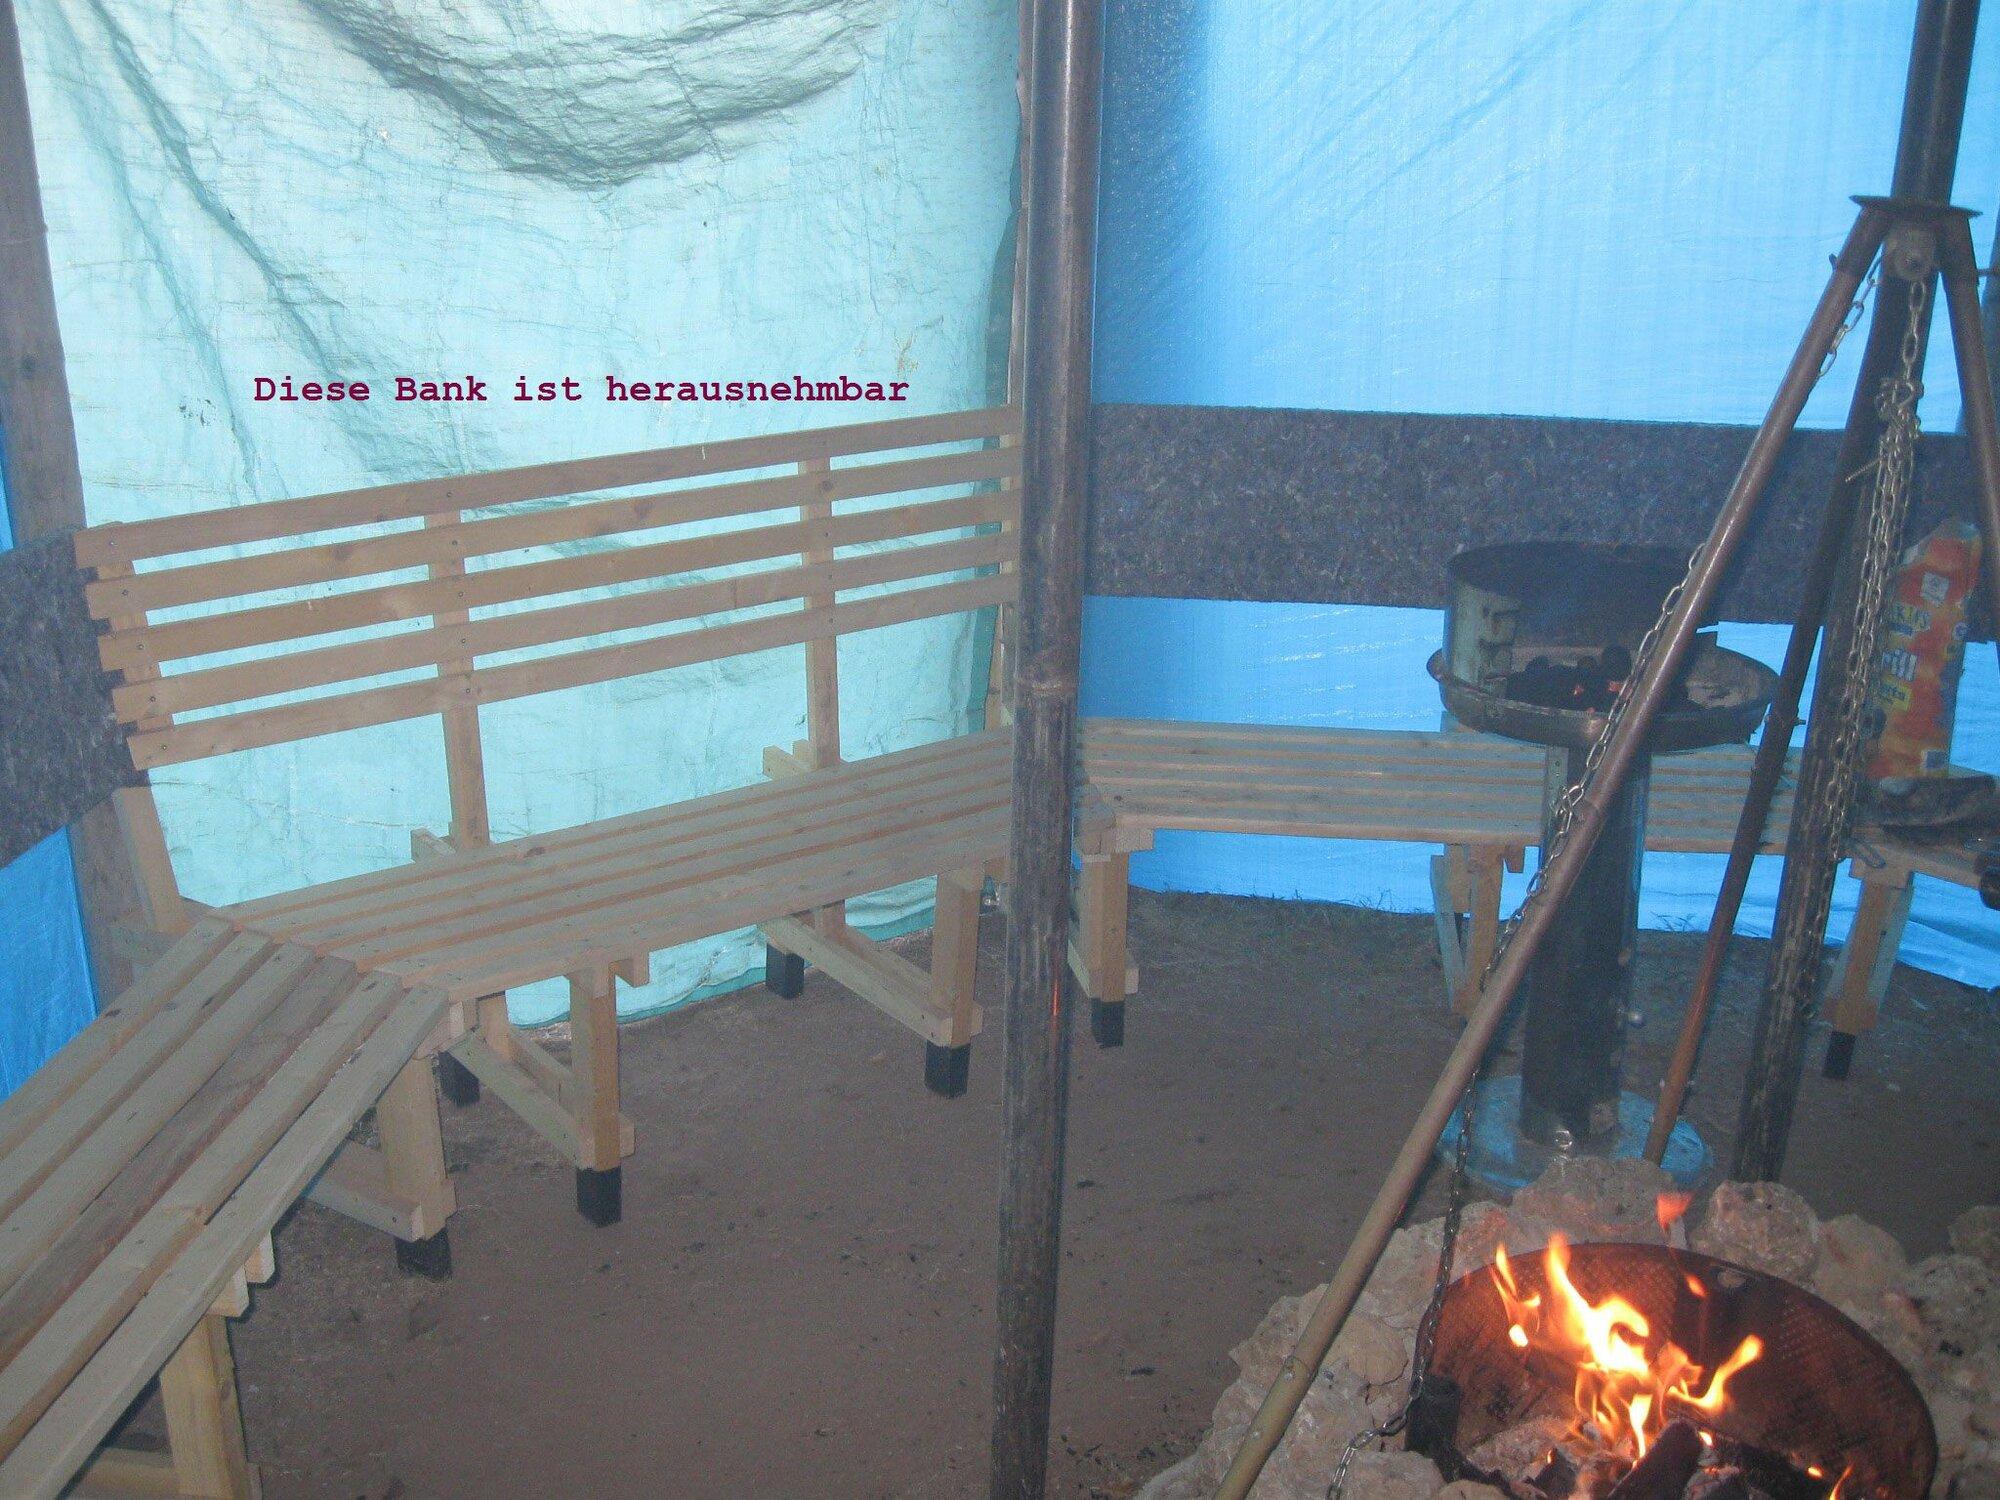 grillhütte11web.jpg